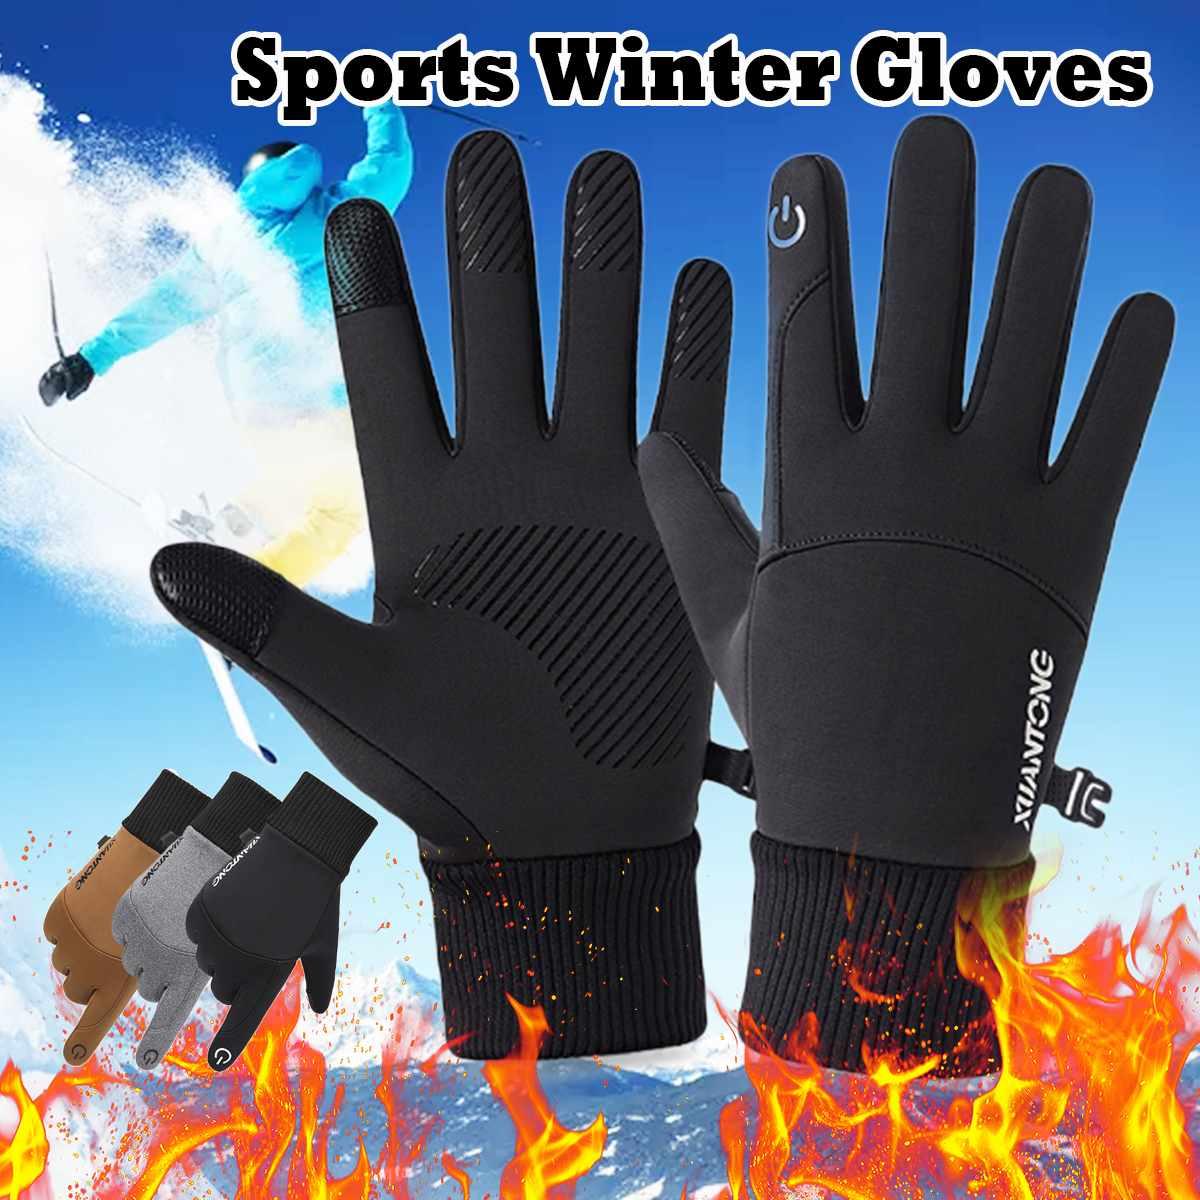 Winter Warm Thermal Gloves Ski Snow Snowboard Gloves Cycling Touchscreen Waterproof Winter Gloves For Men Women